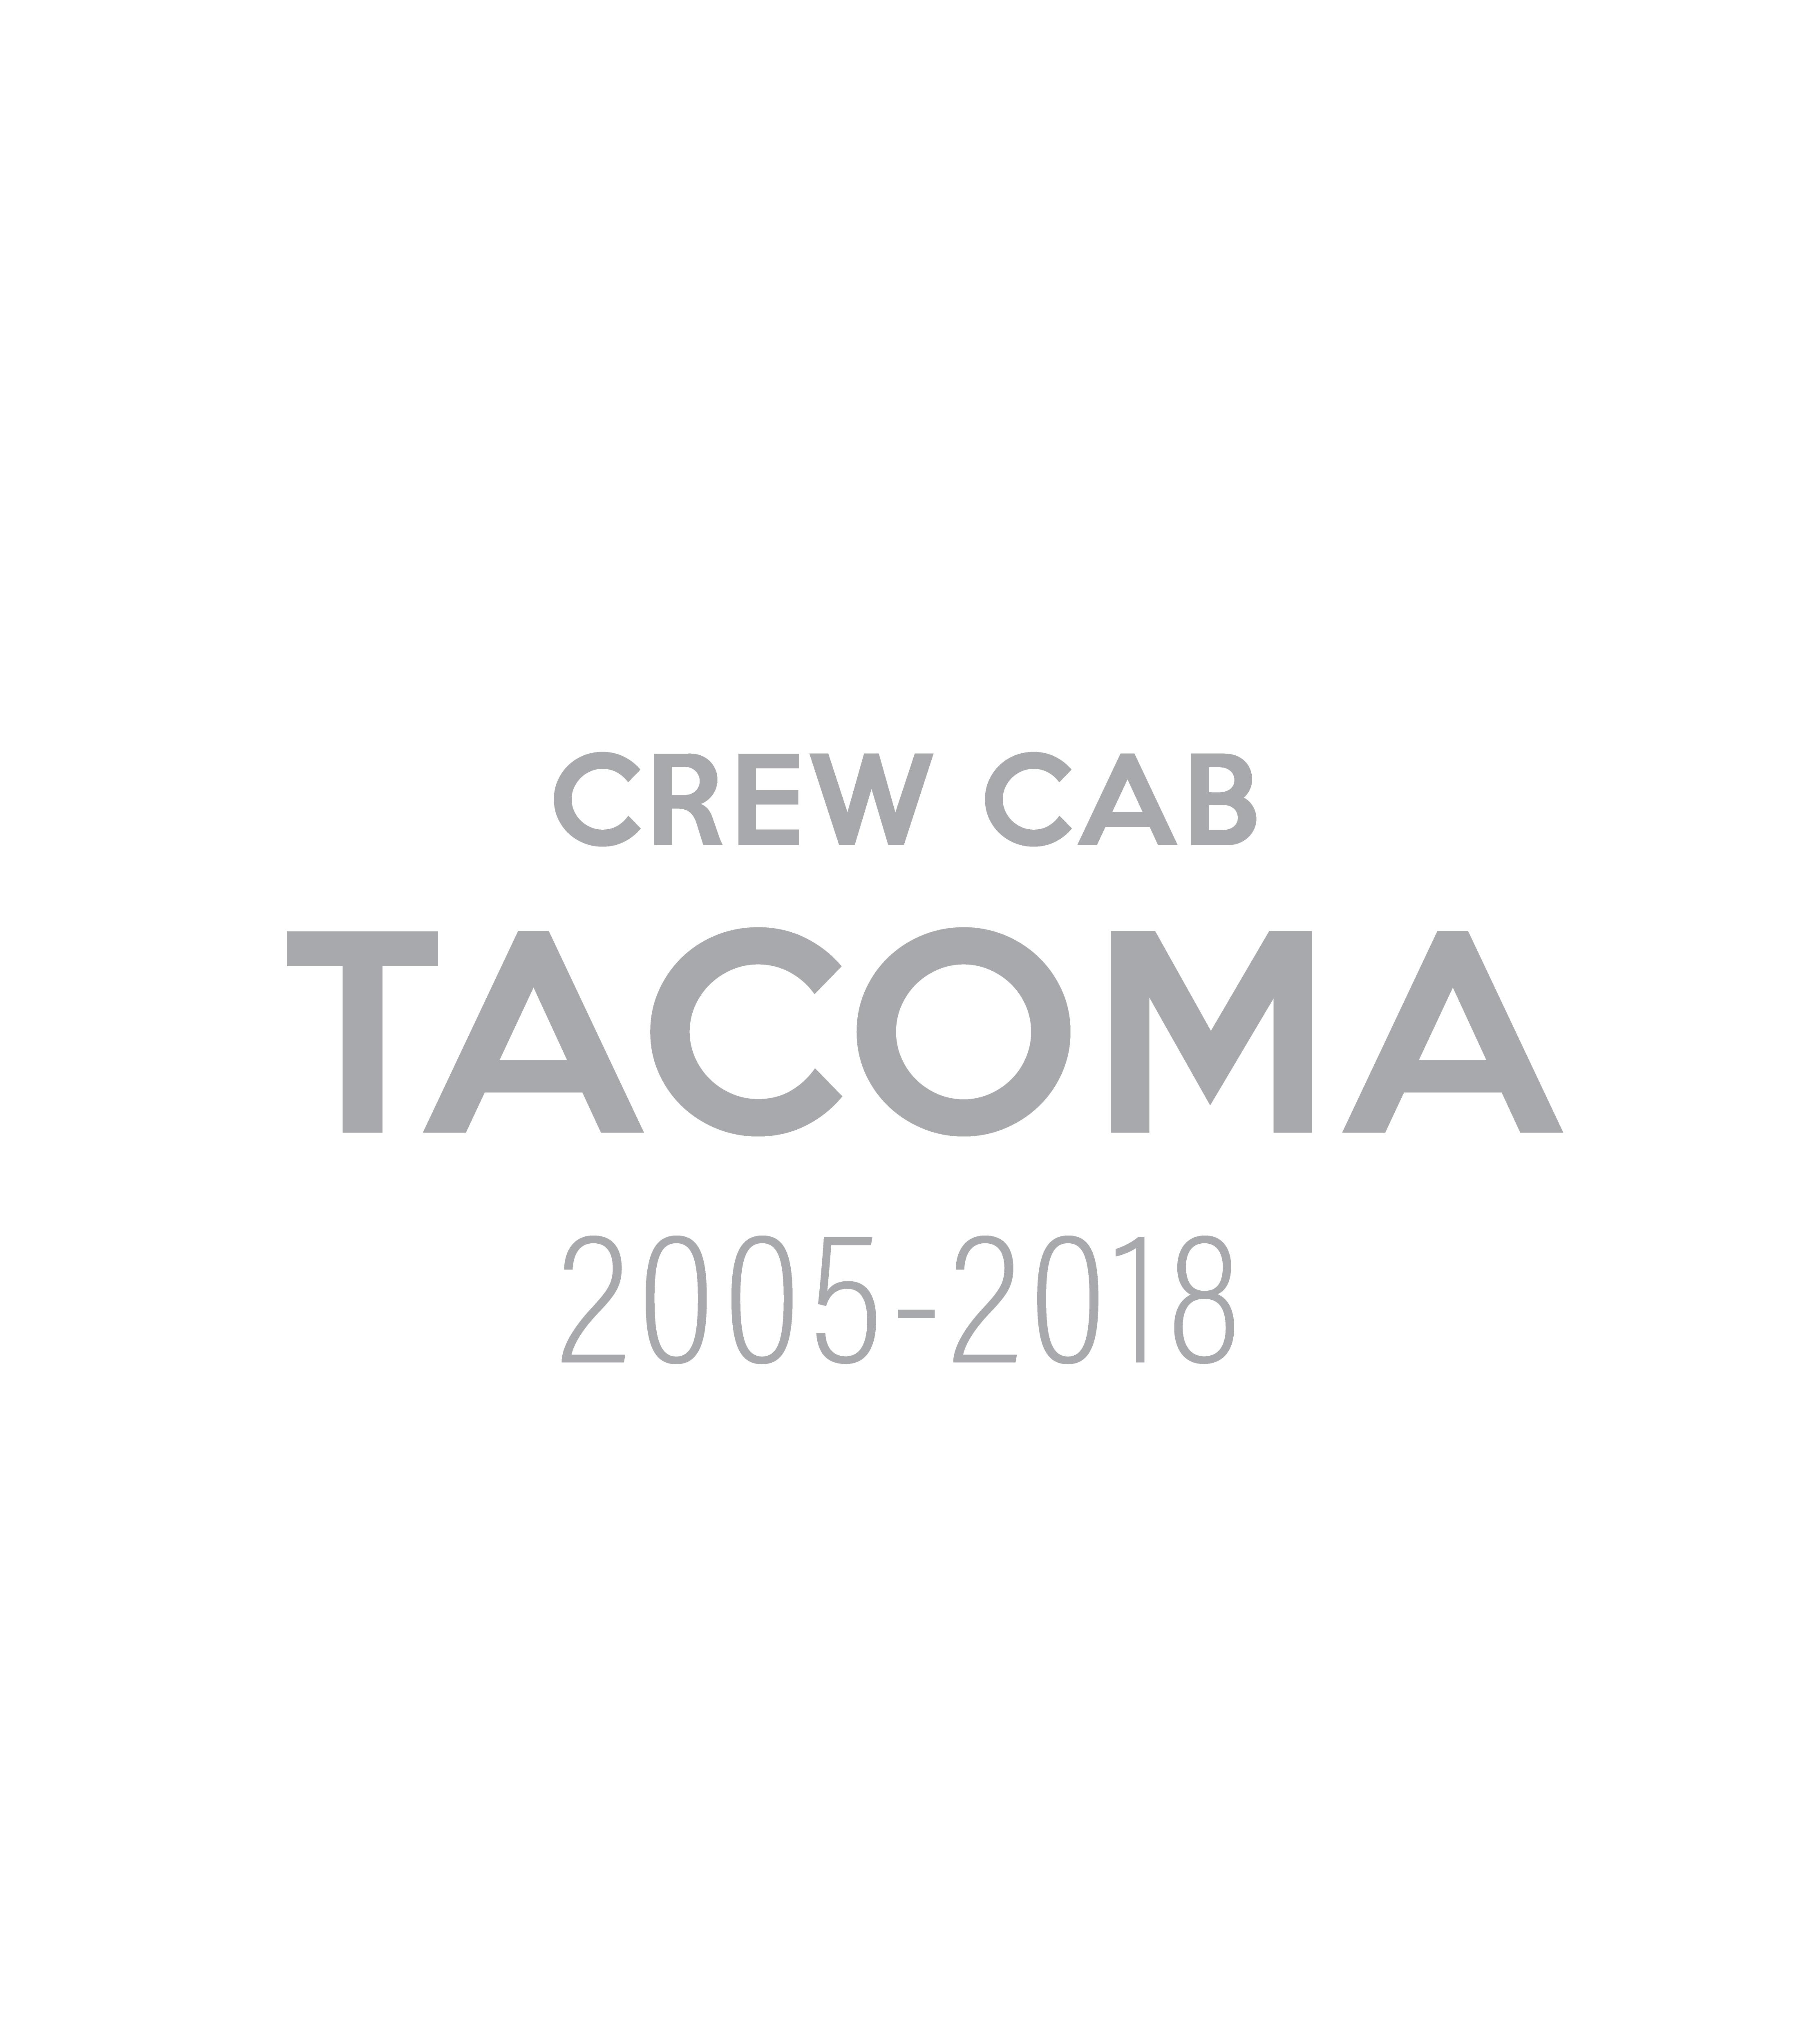 toyota tacoma gallery image